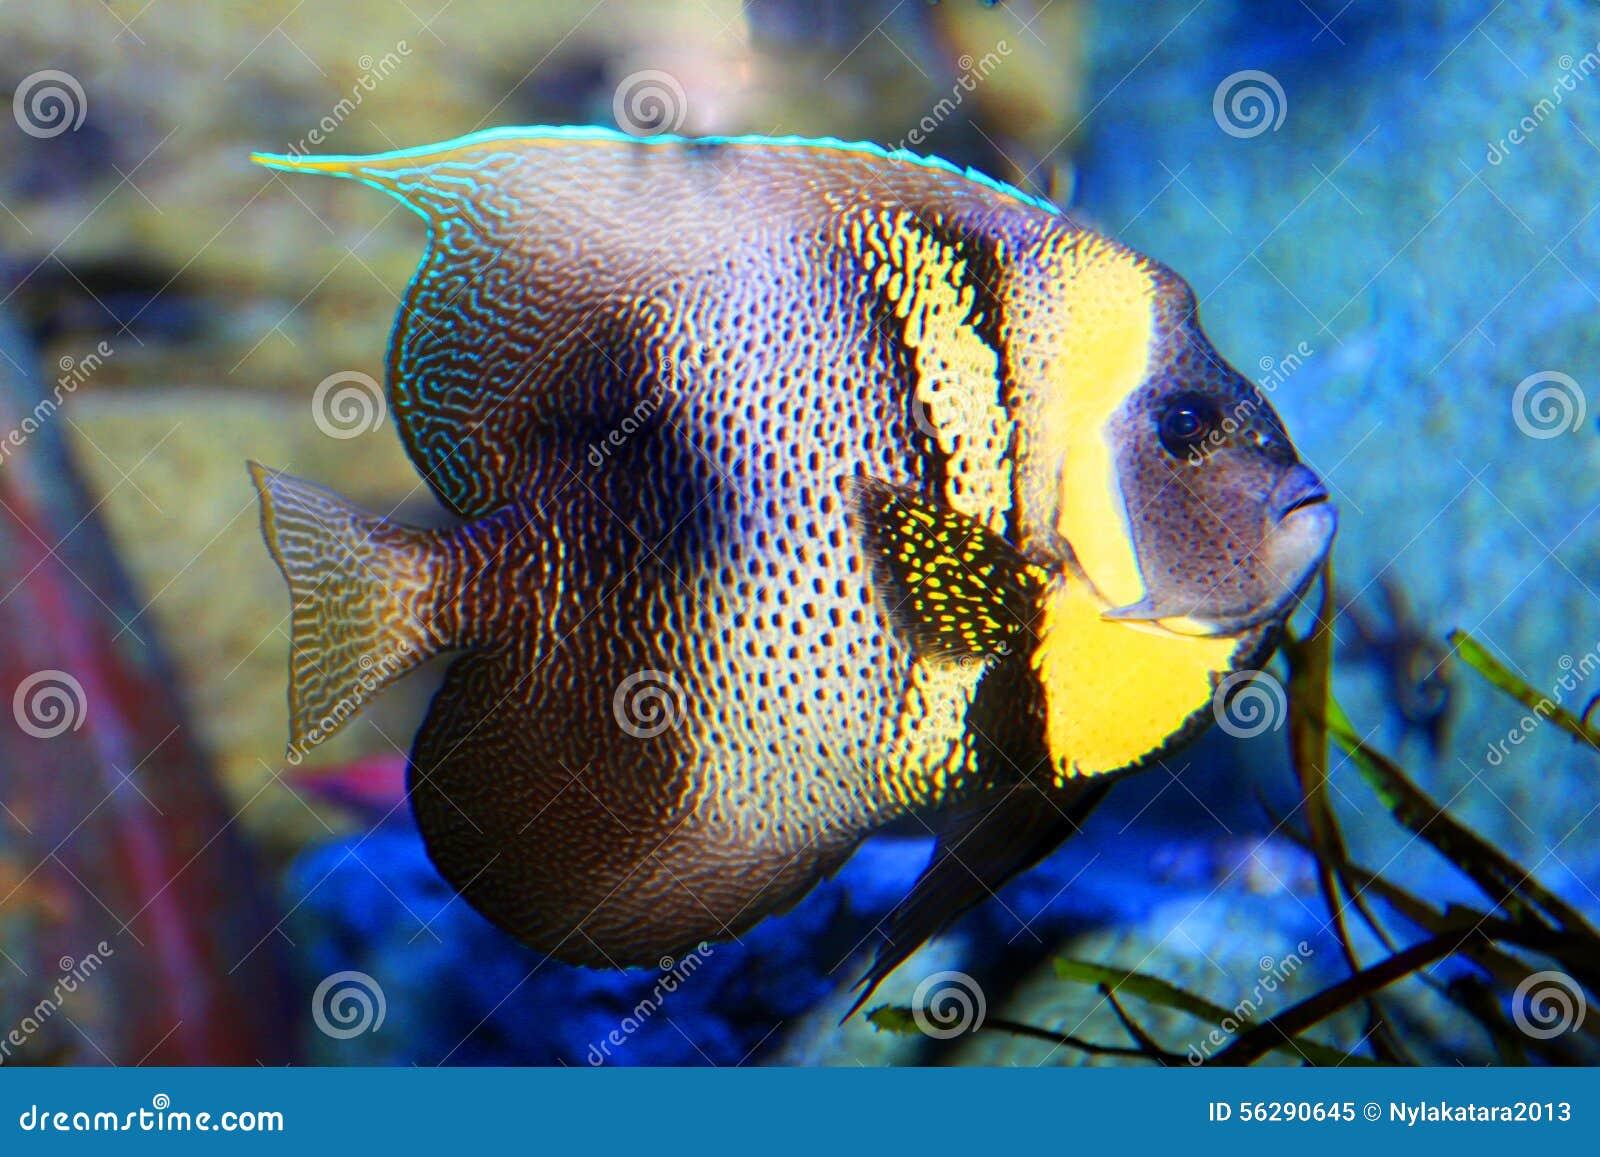 Tropical Fish Stock Photo Image 56290645